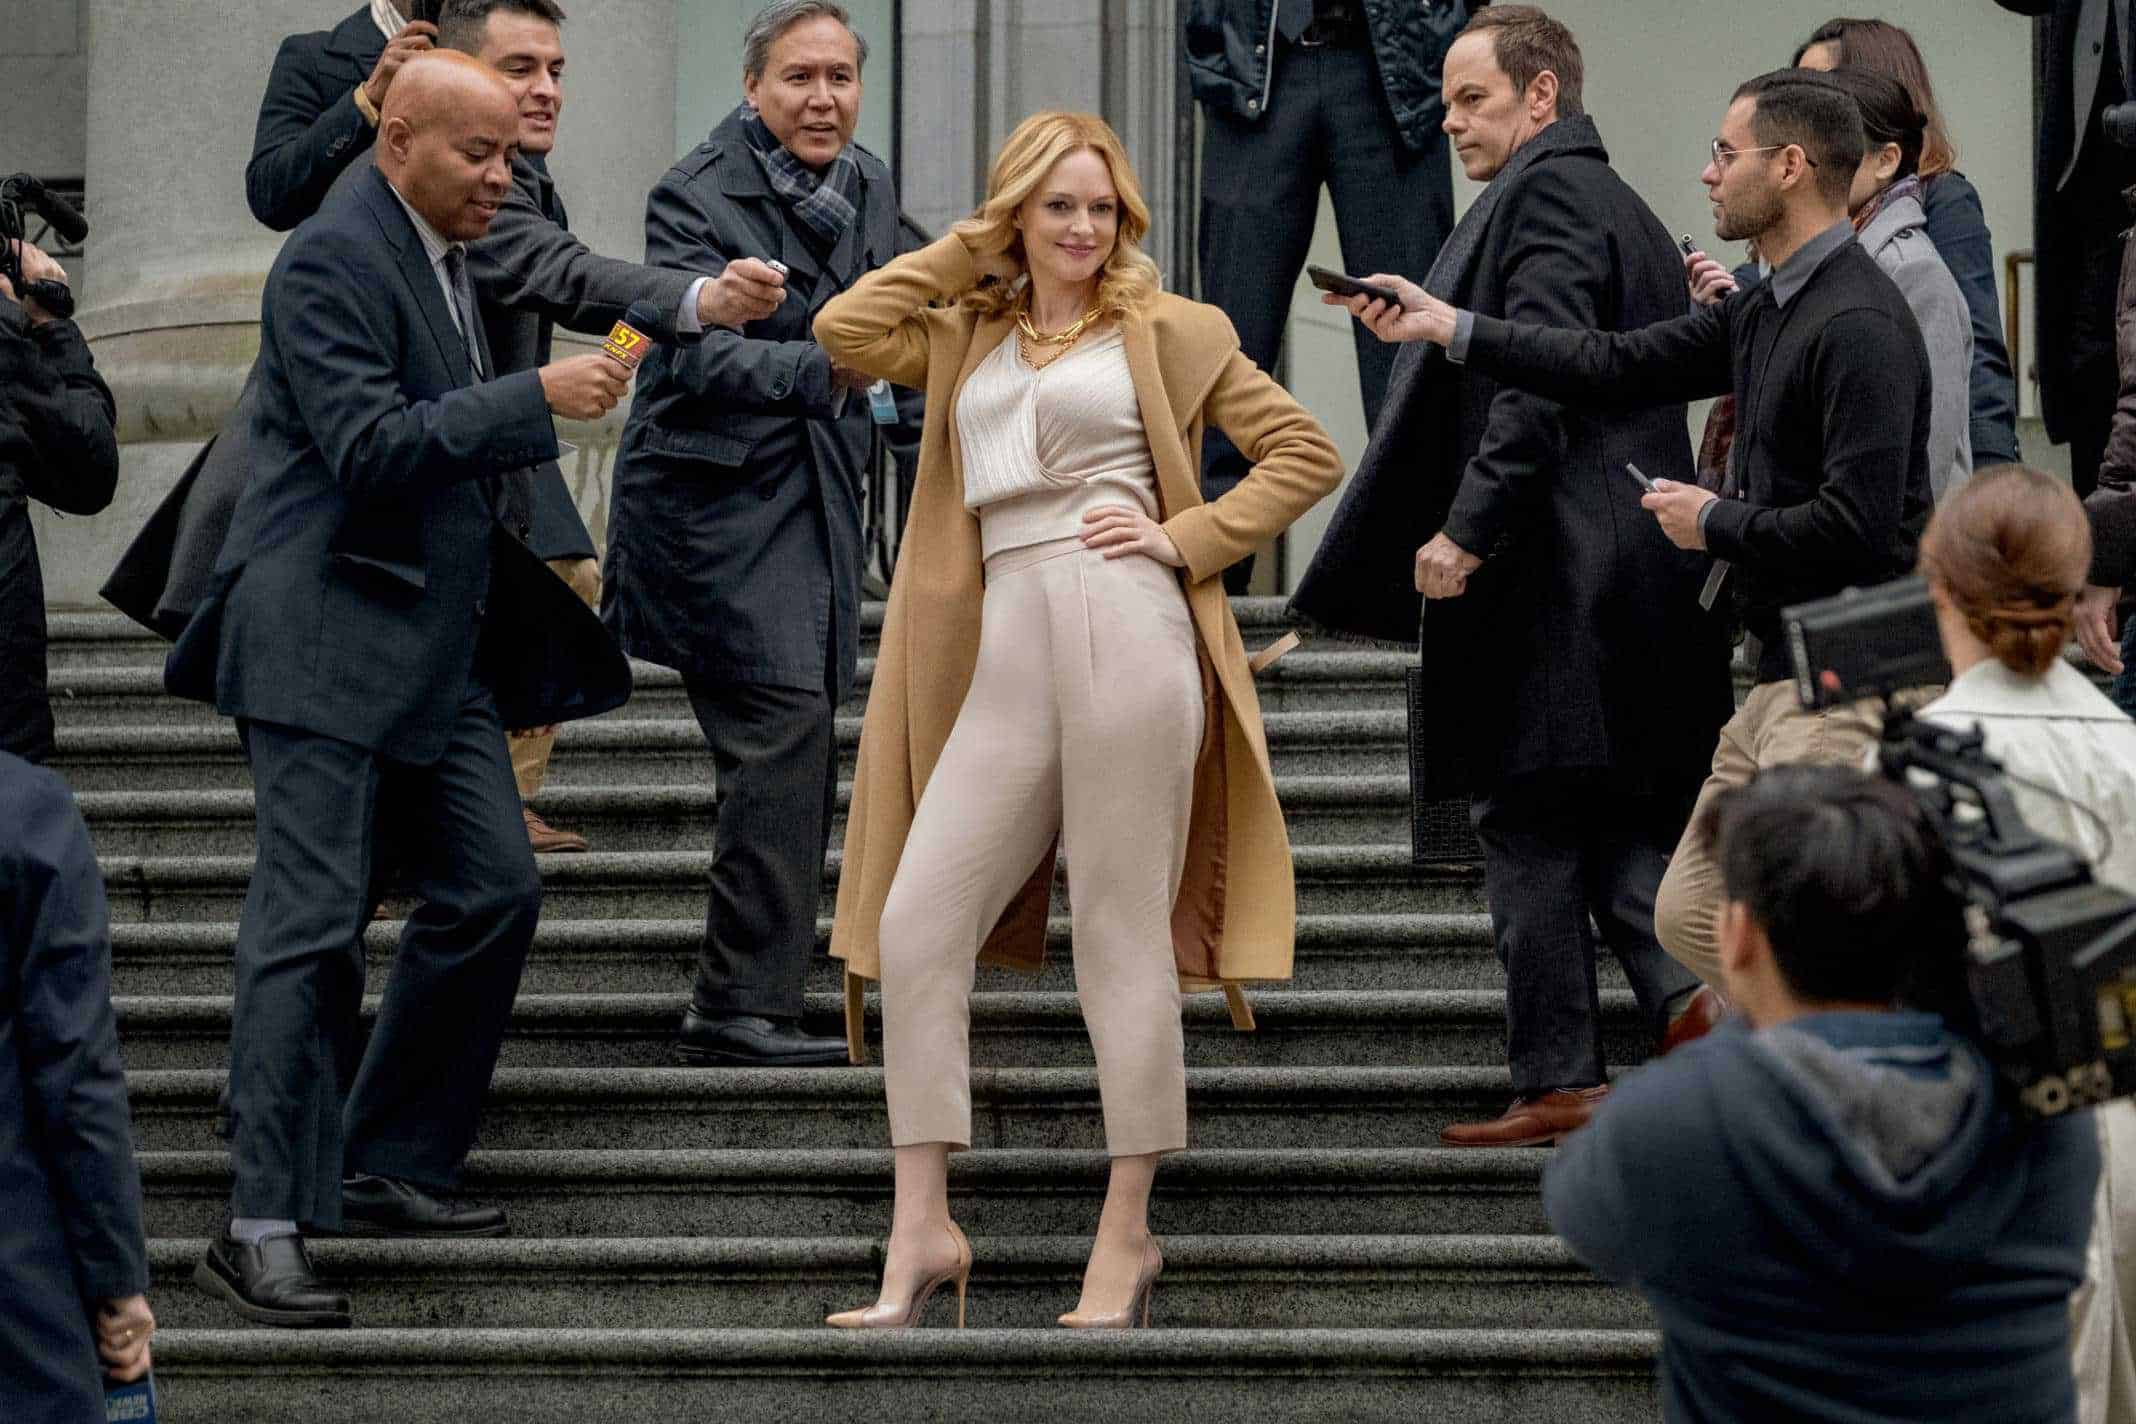 Tamara Taylor (Heather Graham) striking a pose on steps.